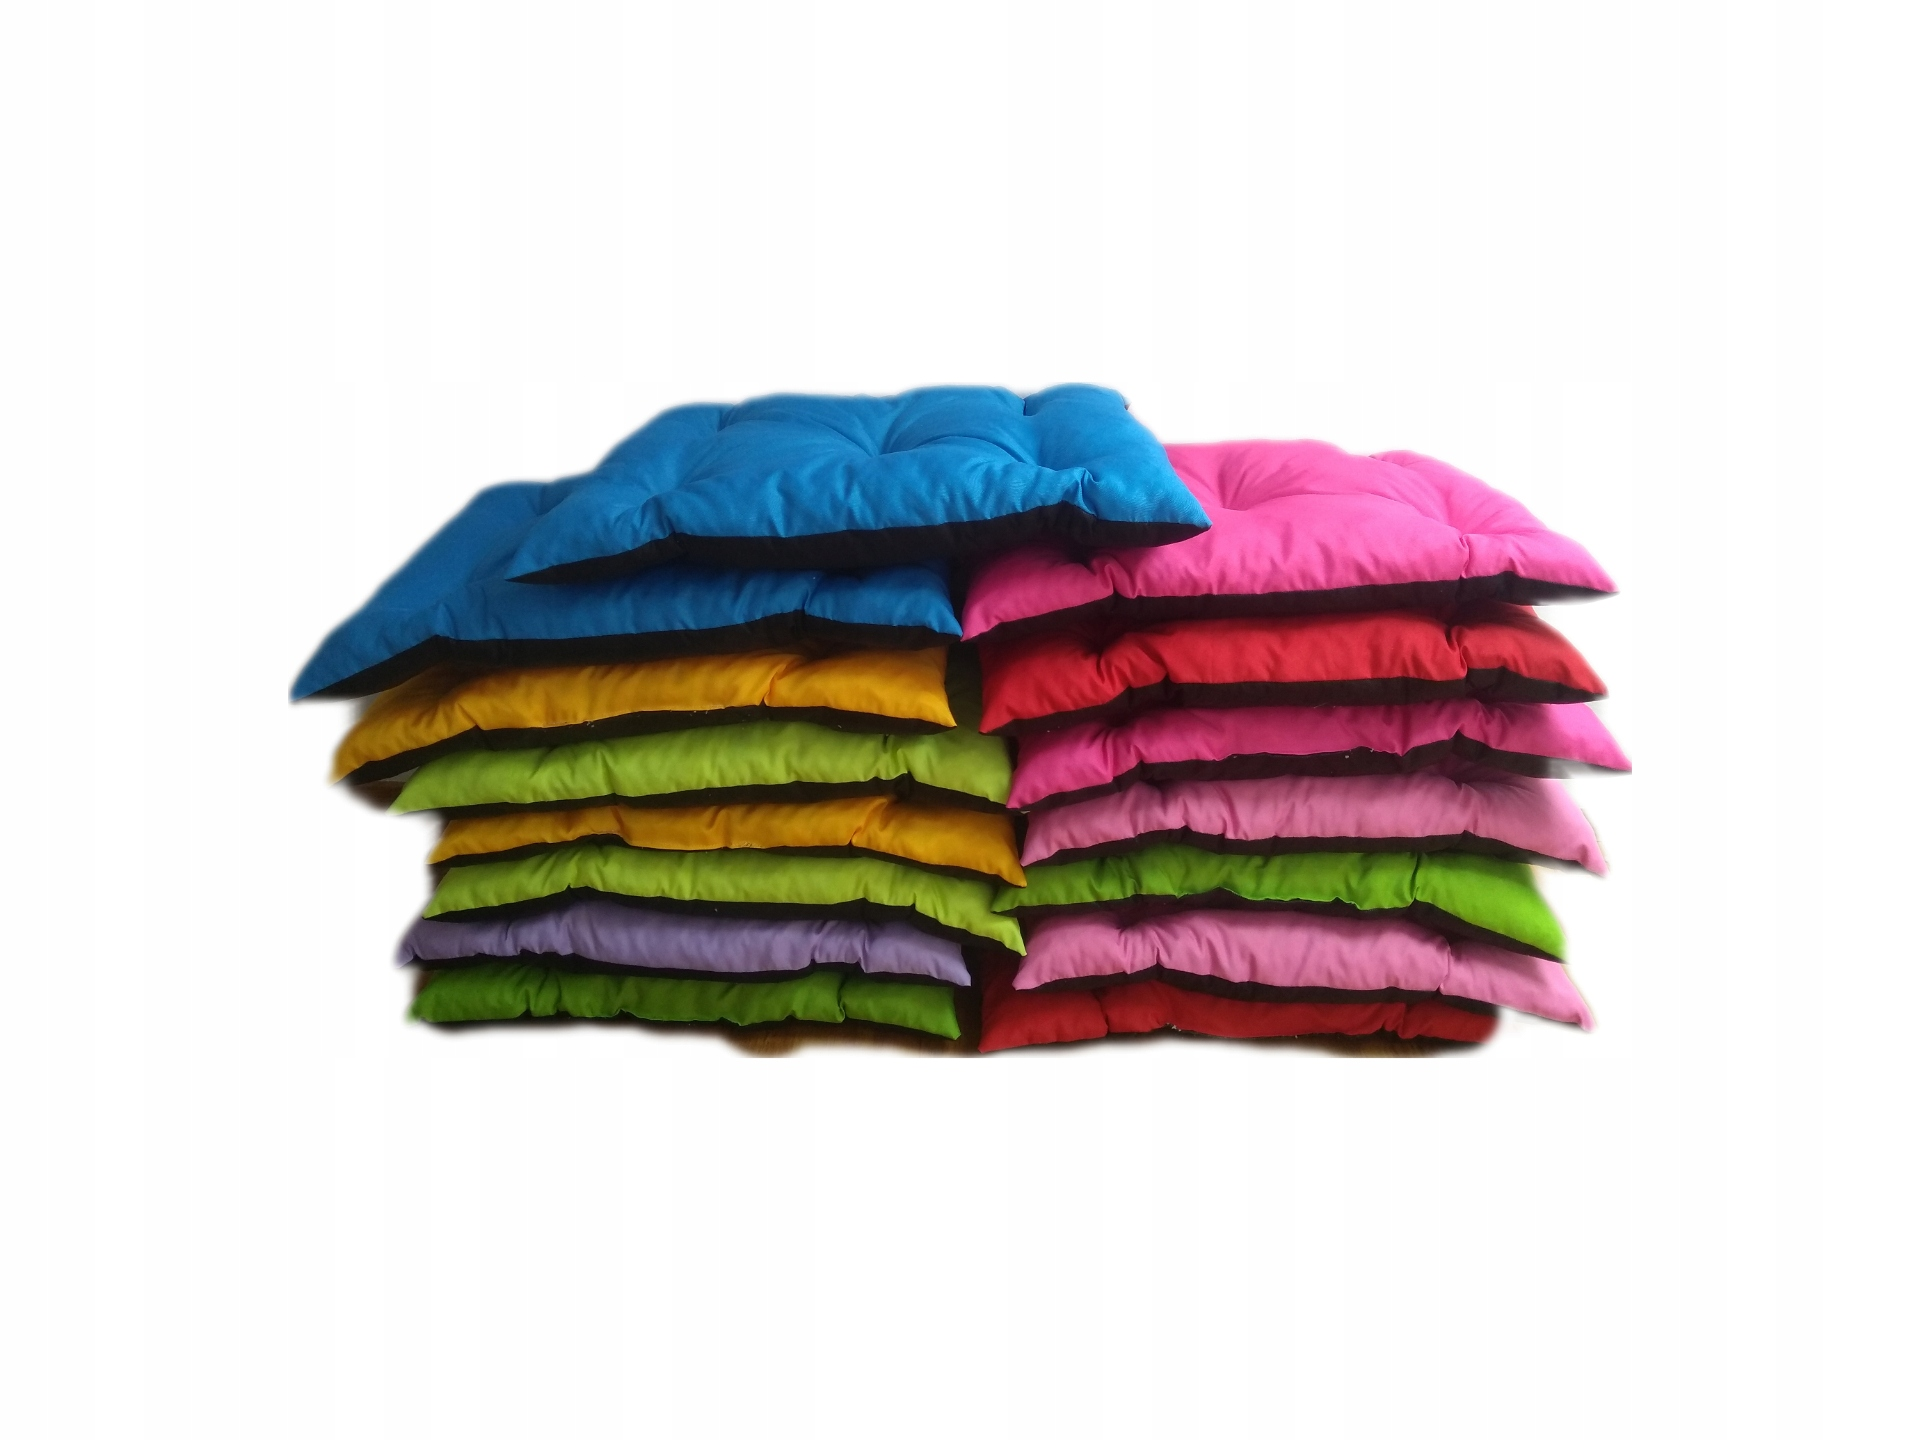 Подушка для Собаки / Кошки 70х100 + ИМЯ БЕСПЛАТНО